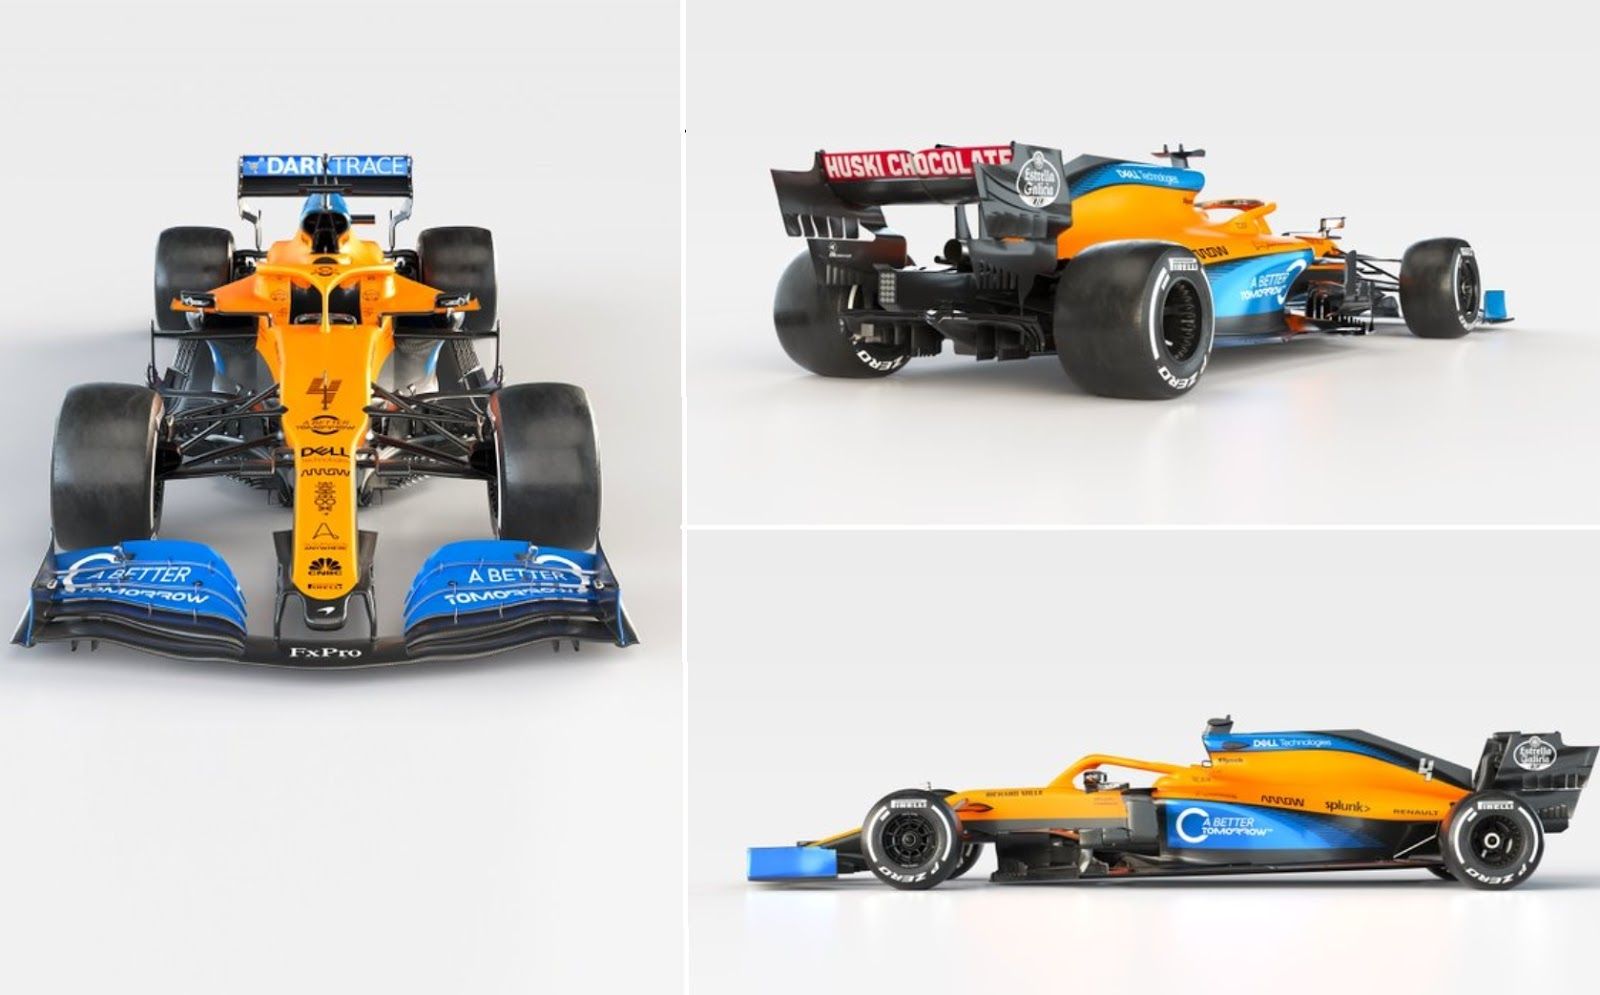 McLaren F1 car design 2020